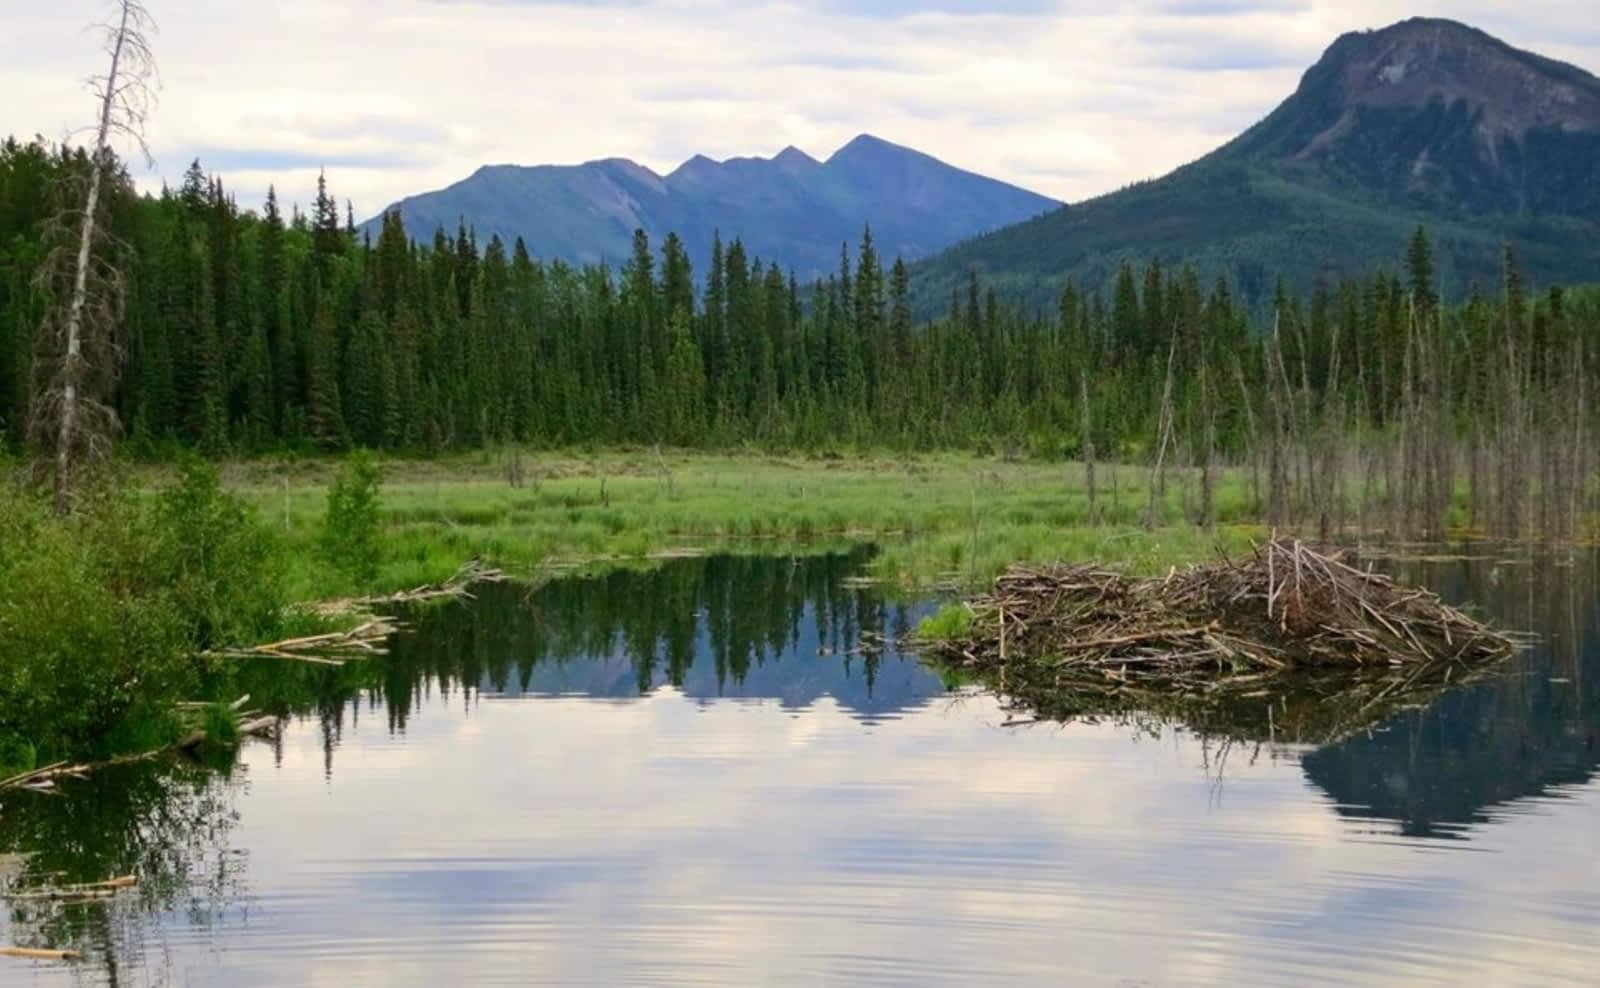 Toad River Lodge & RV Park - Opening Hours - Mile 422 Alaska